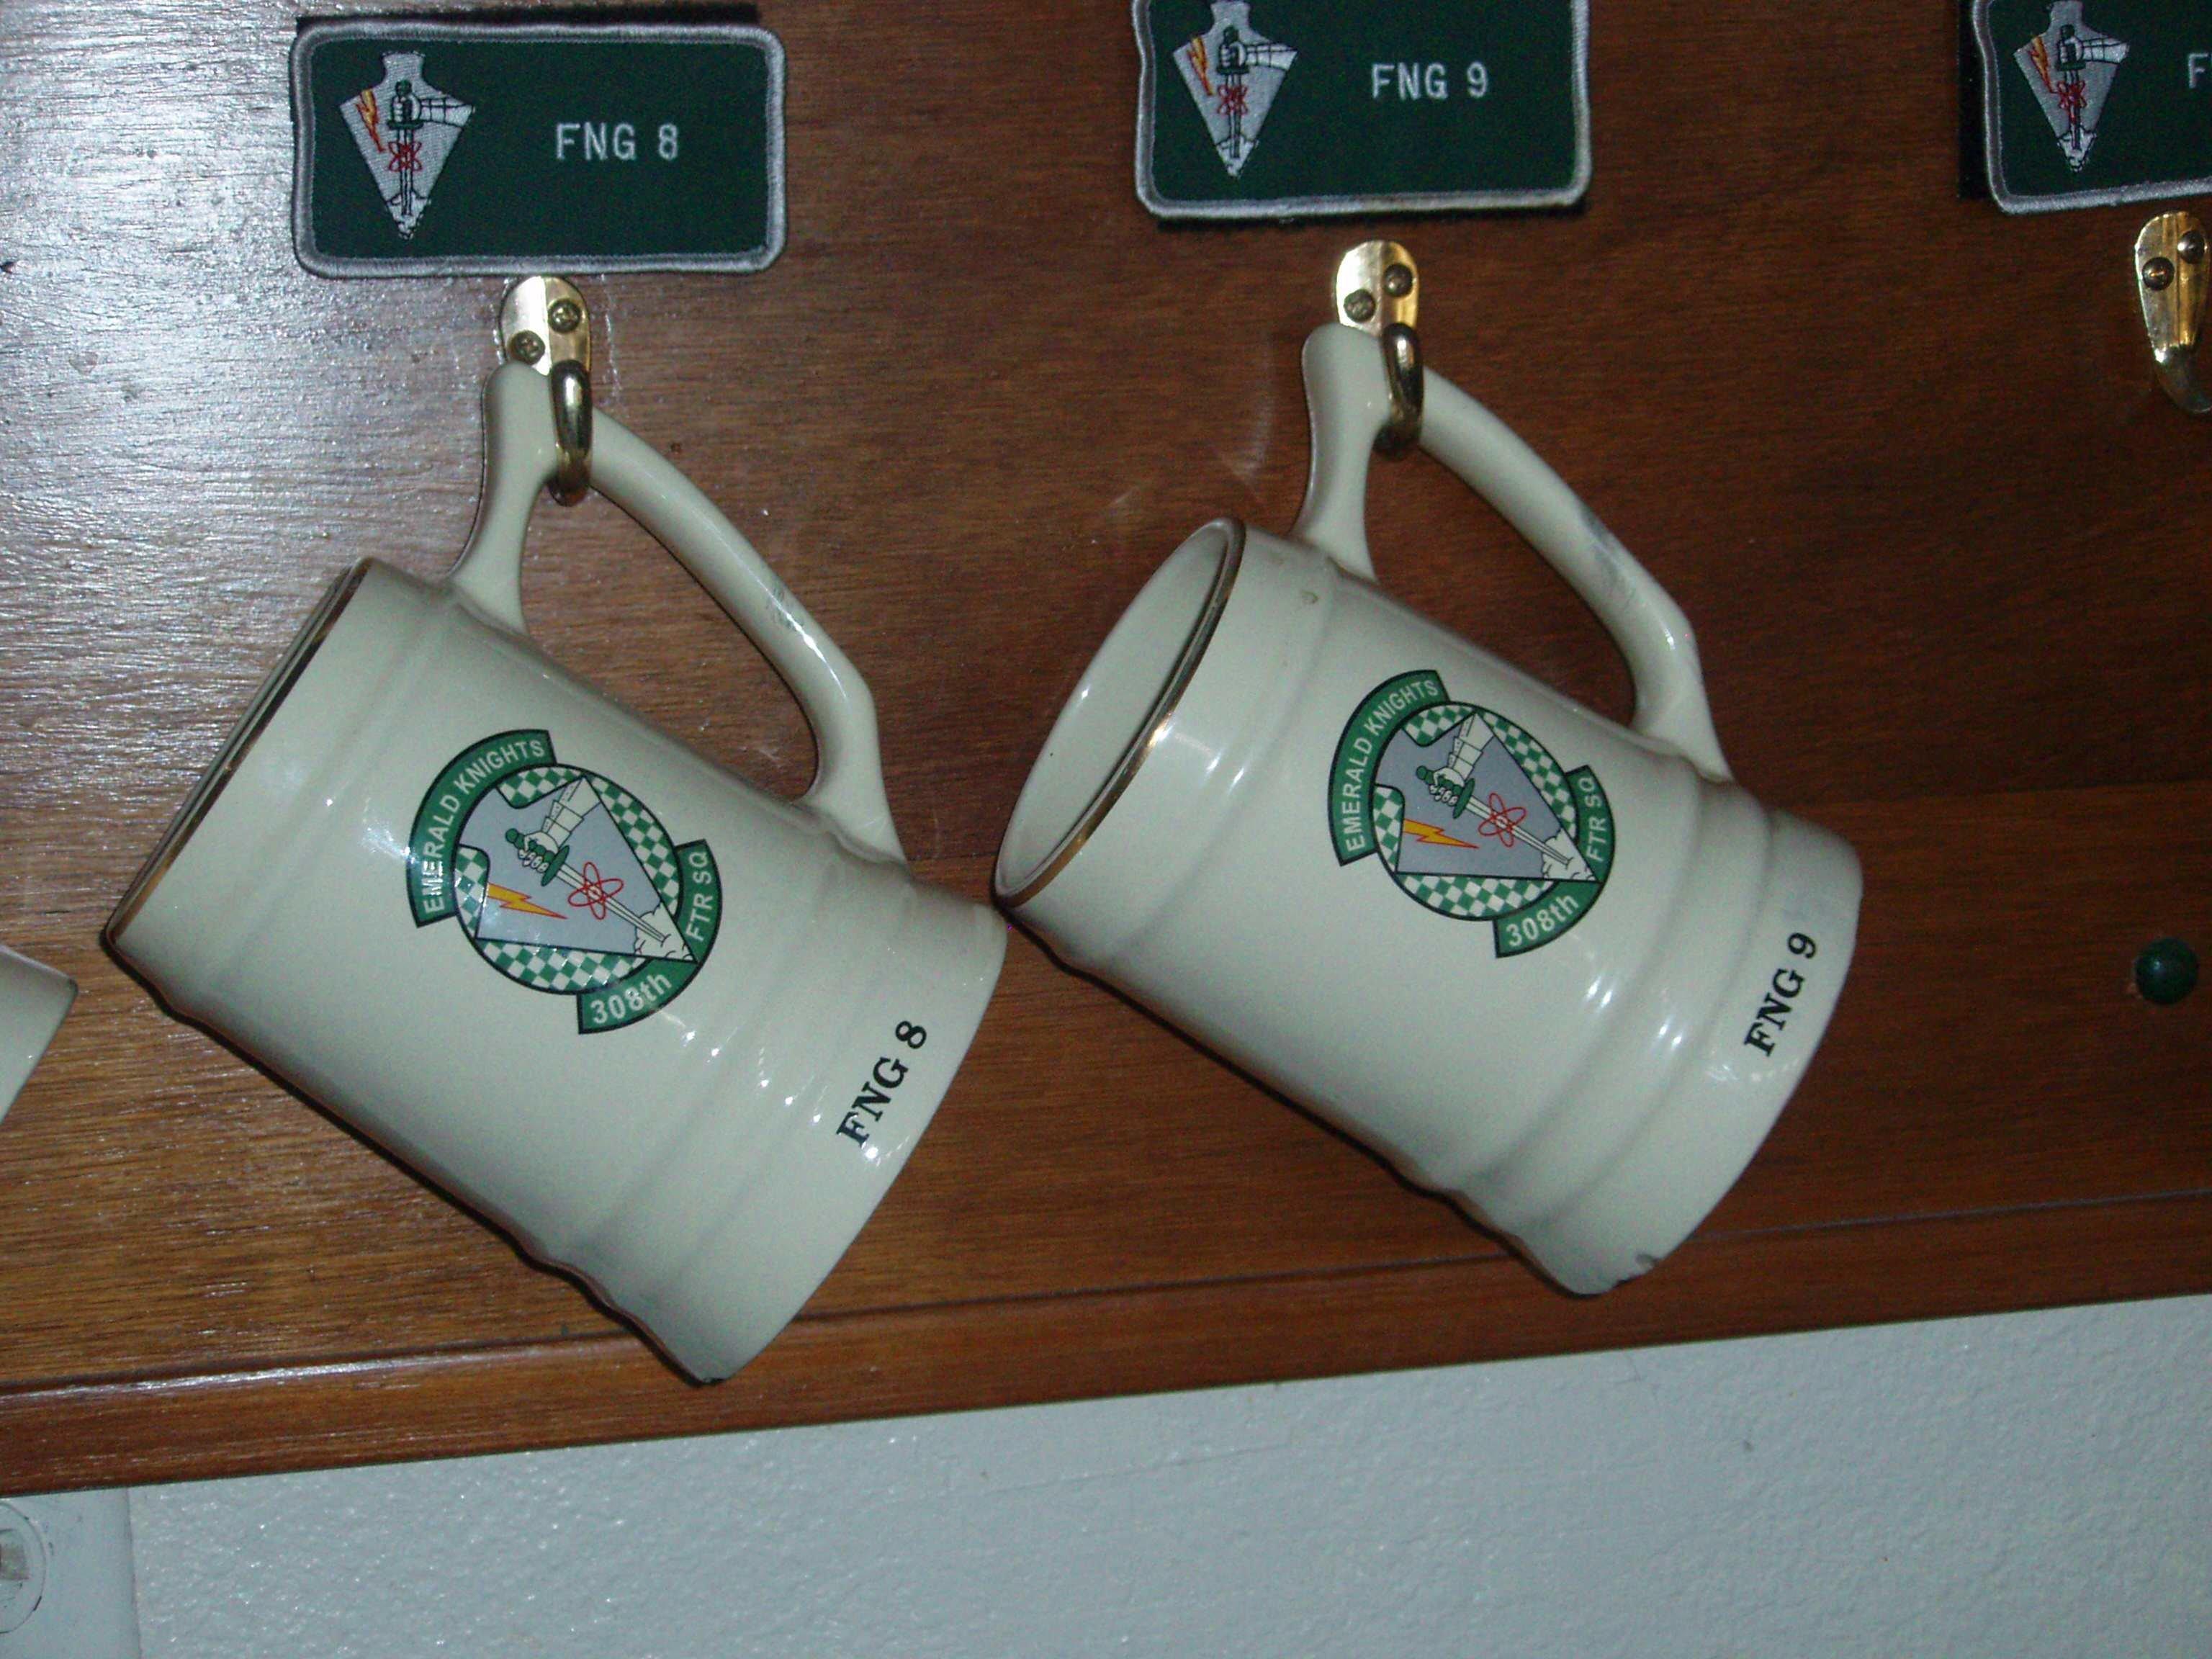 Close-up of pilot mugs in training squadron